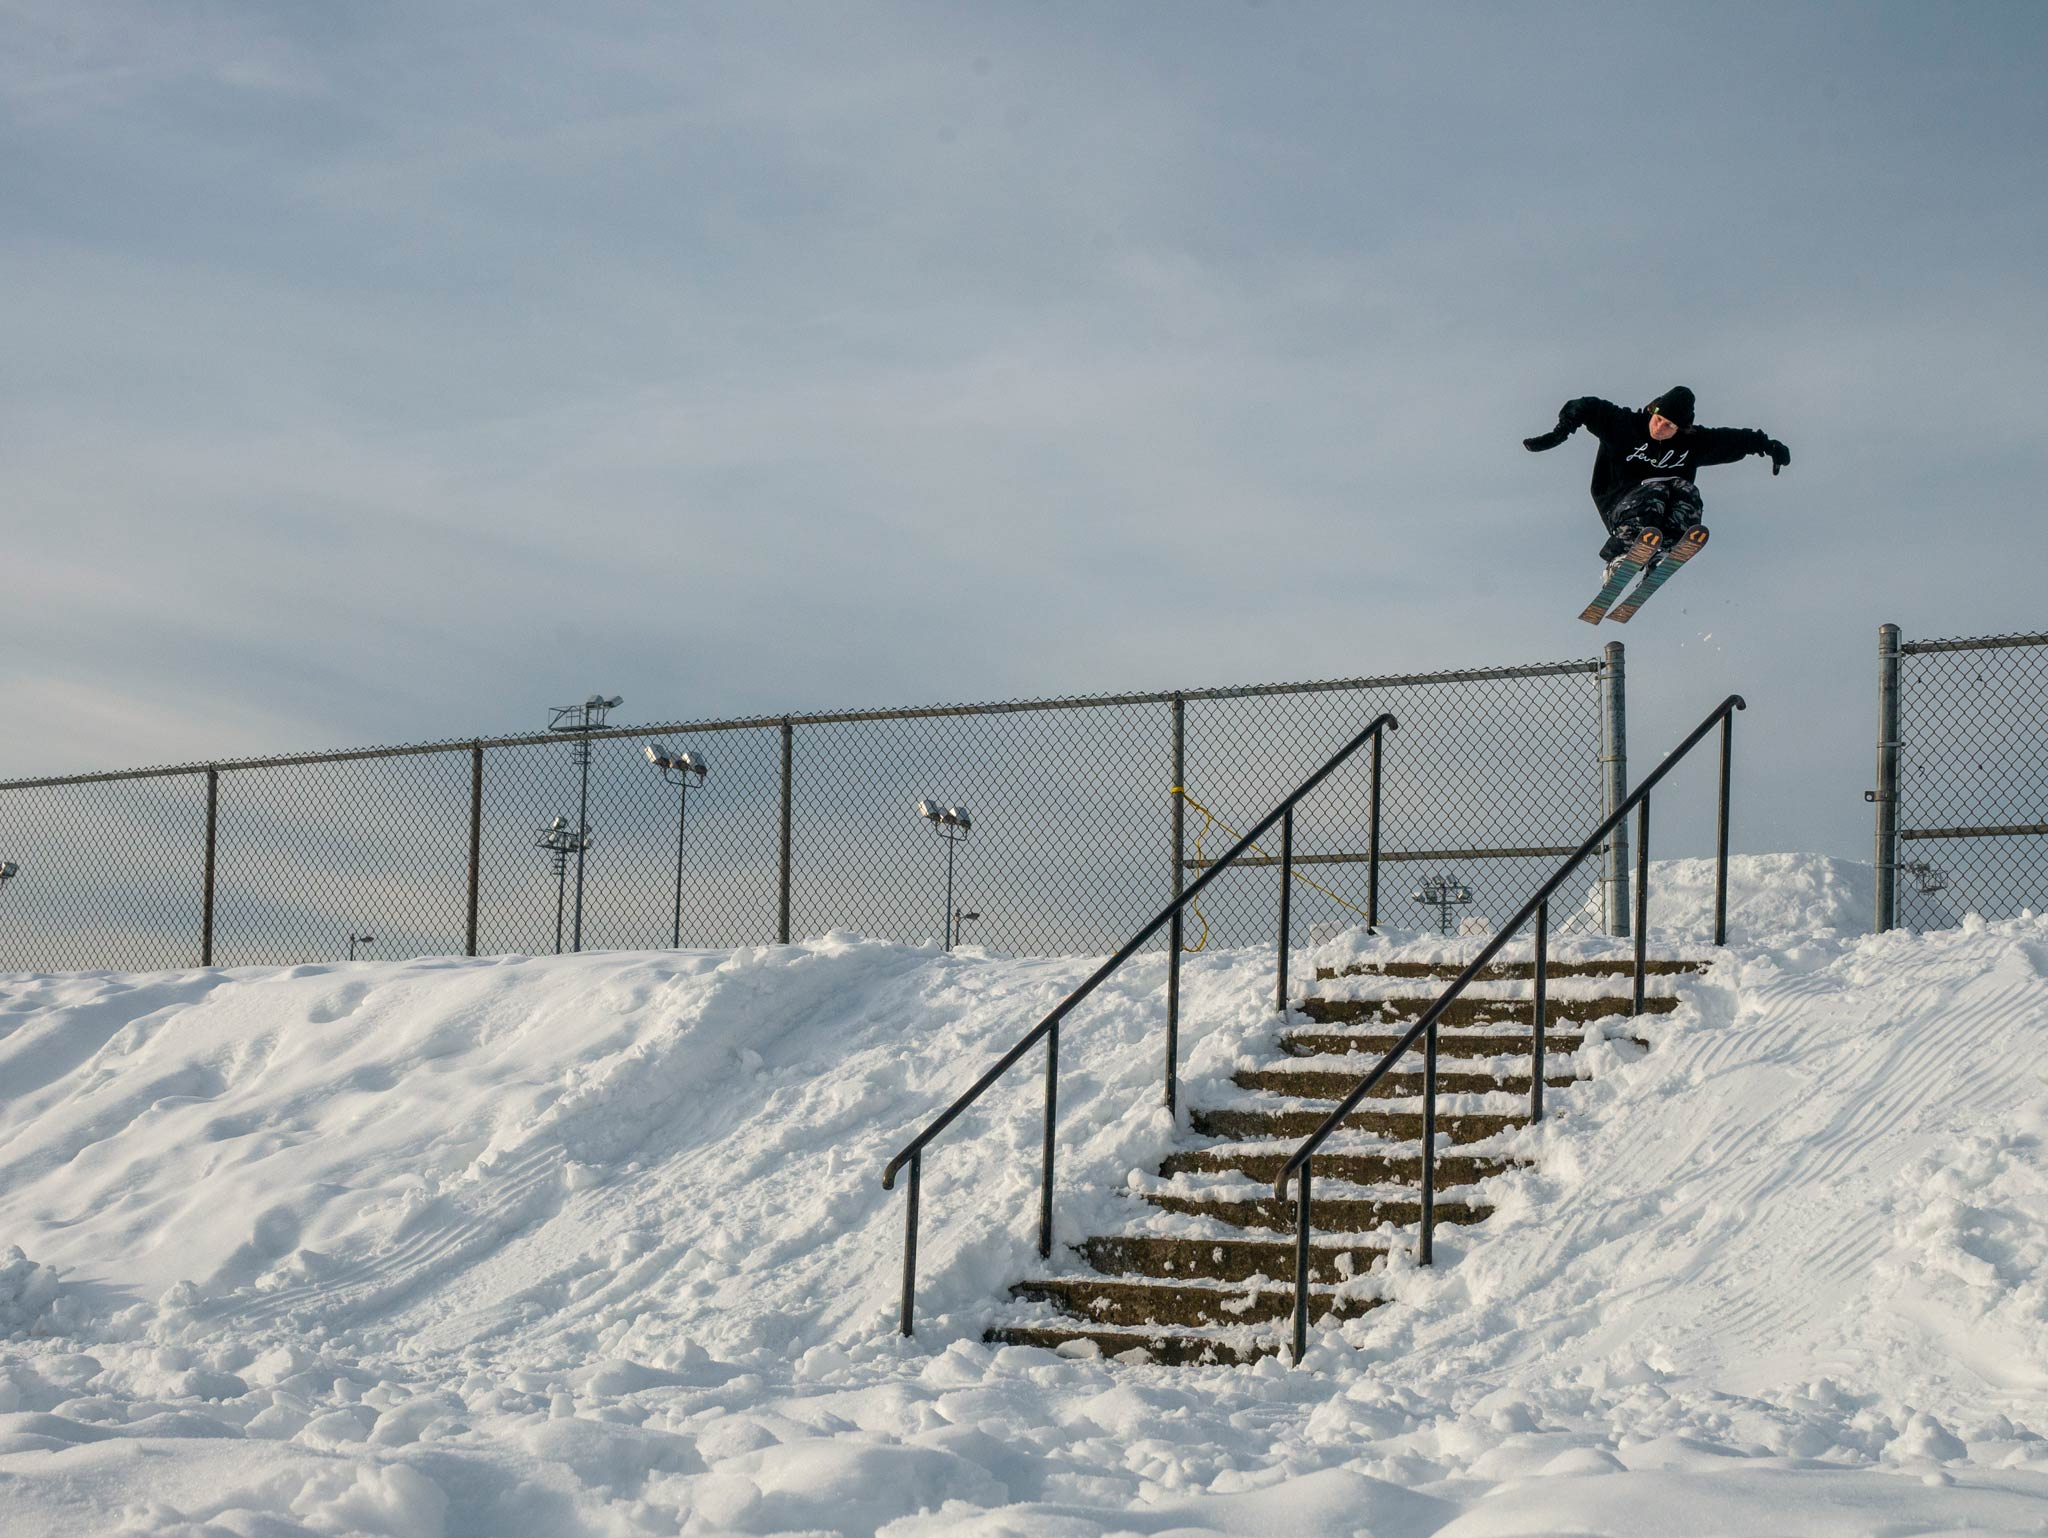 Rider: Noah Albaladejo - Foto: Brady Perron